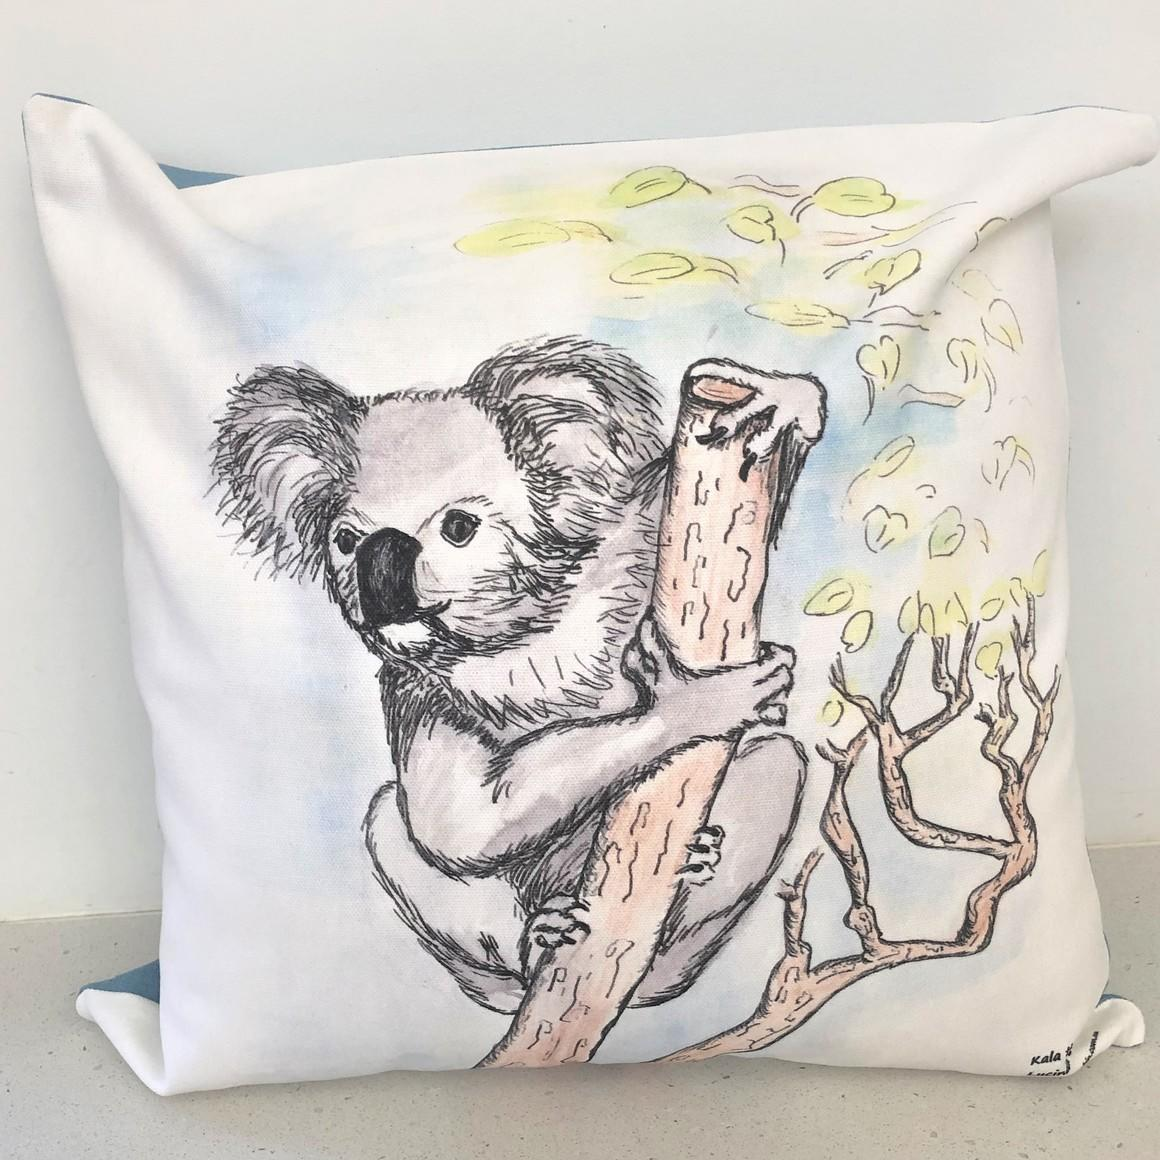 Cushion Cover - Kala the Koala   Trada Marketplace